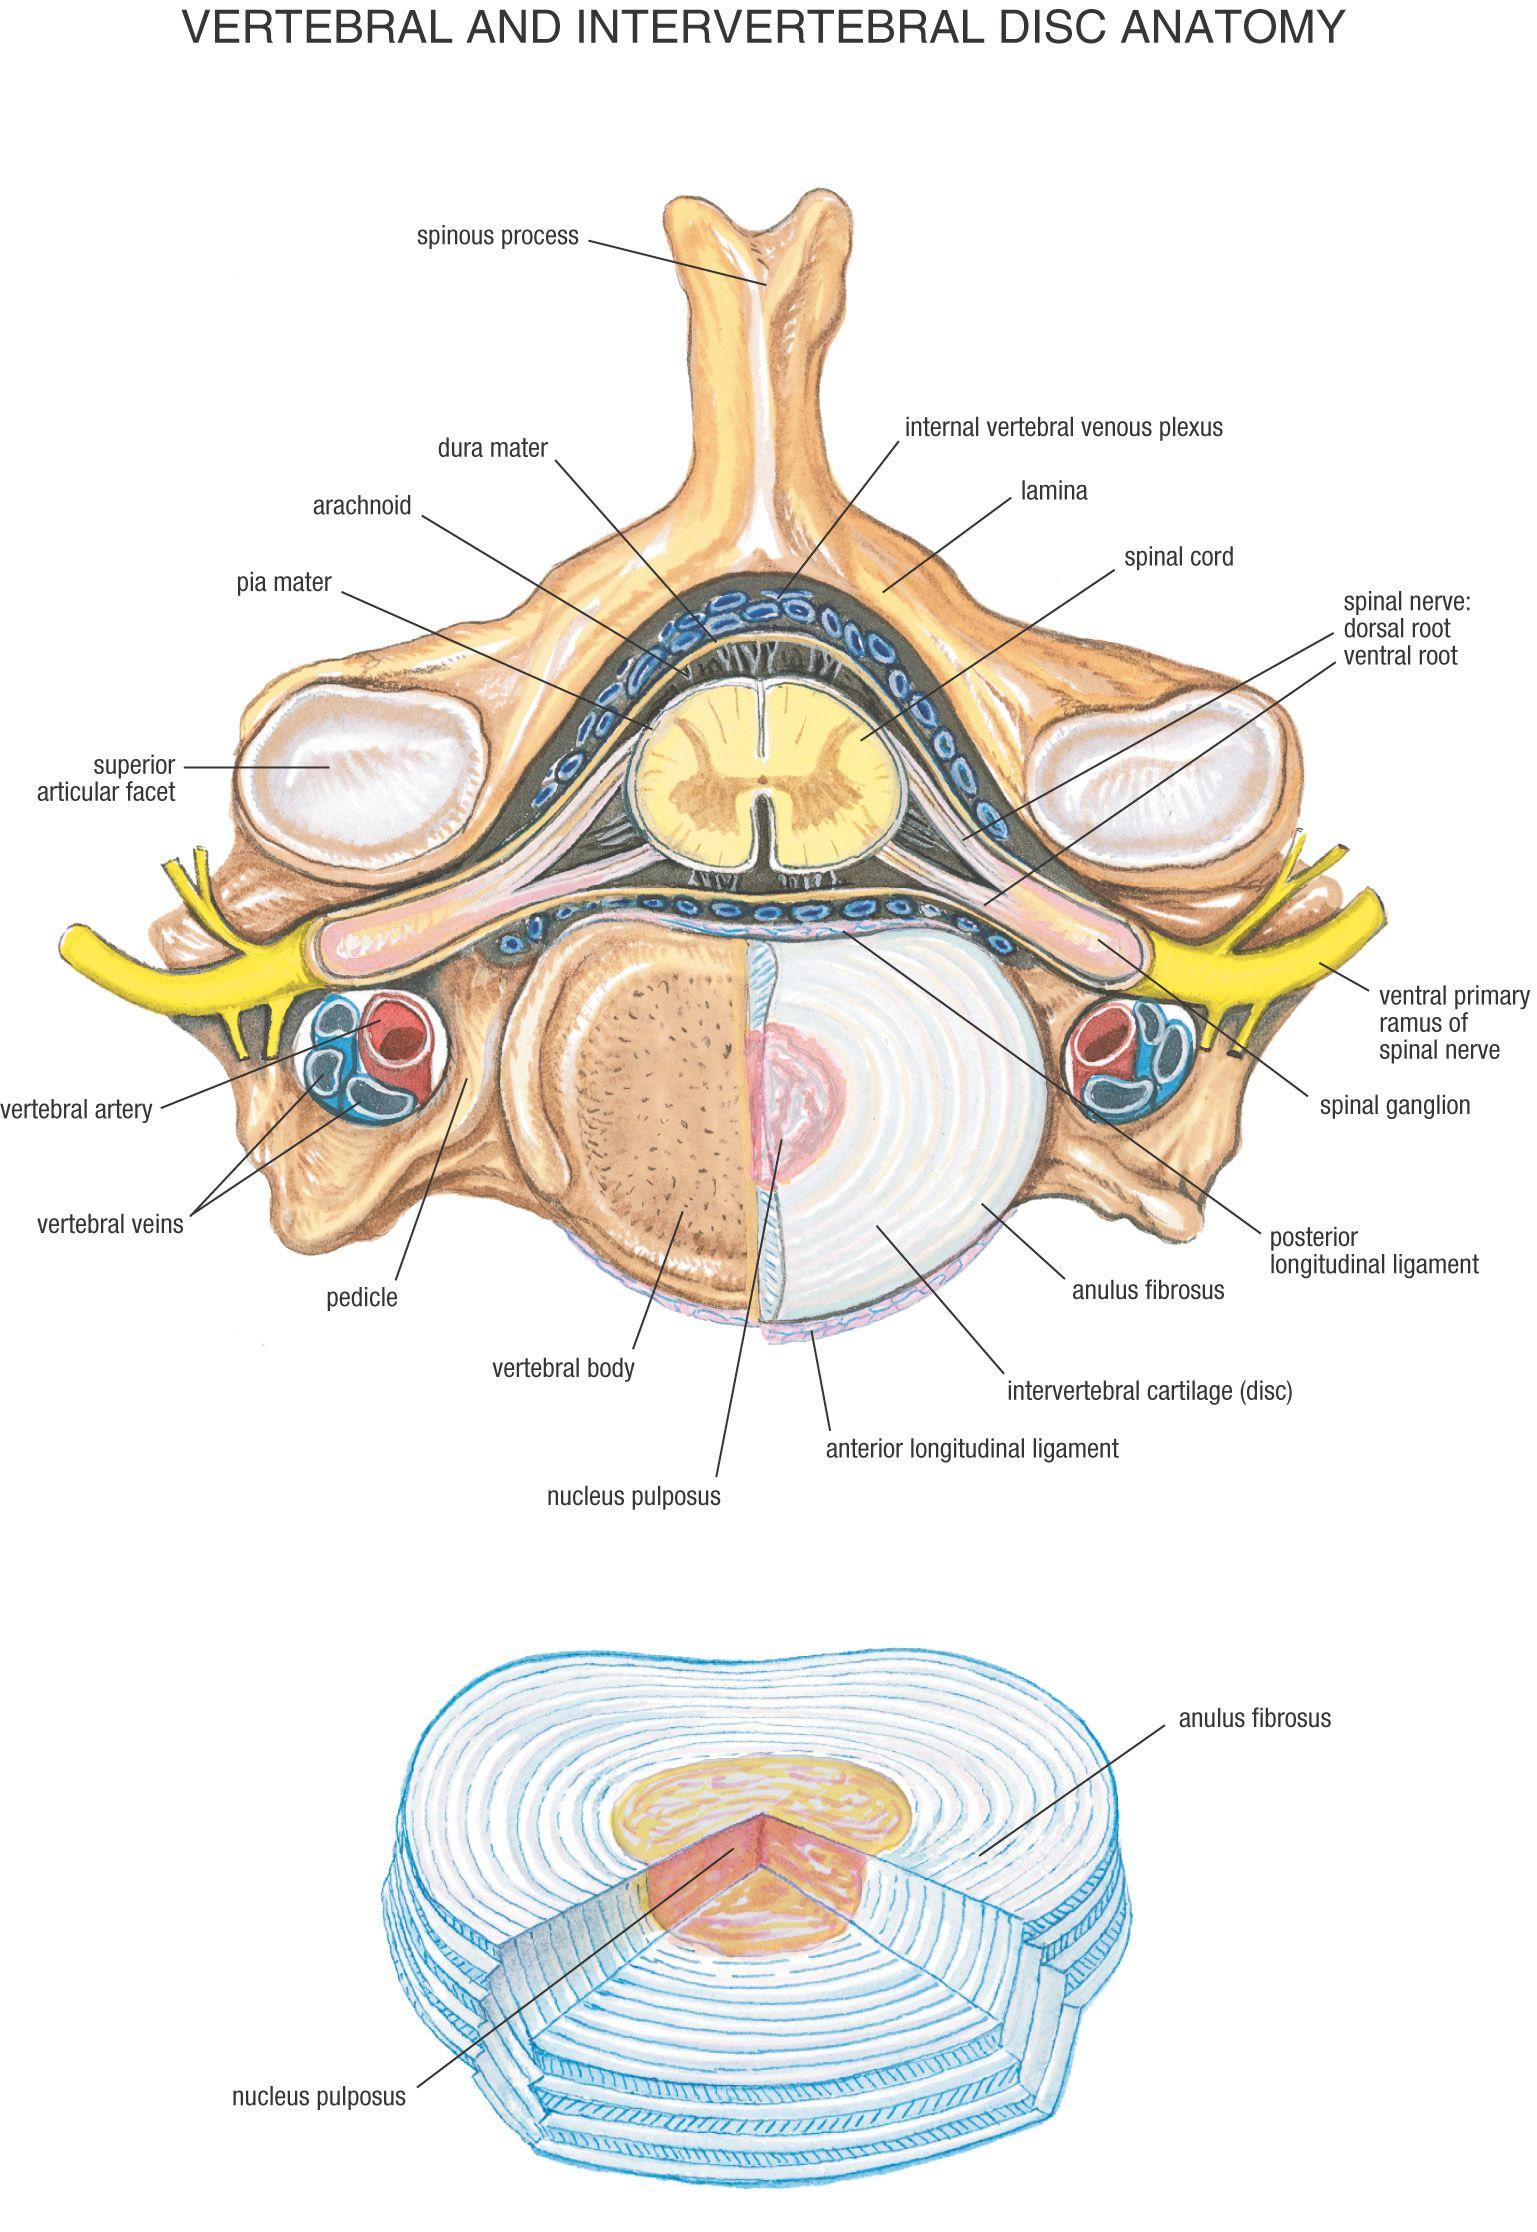 Fysiurgisk Massør   Tag hånd om din krop   Anatomy   Pinterest ...